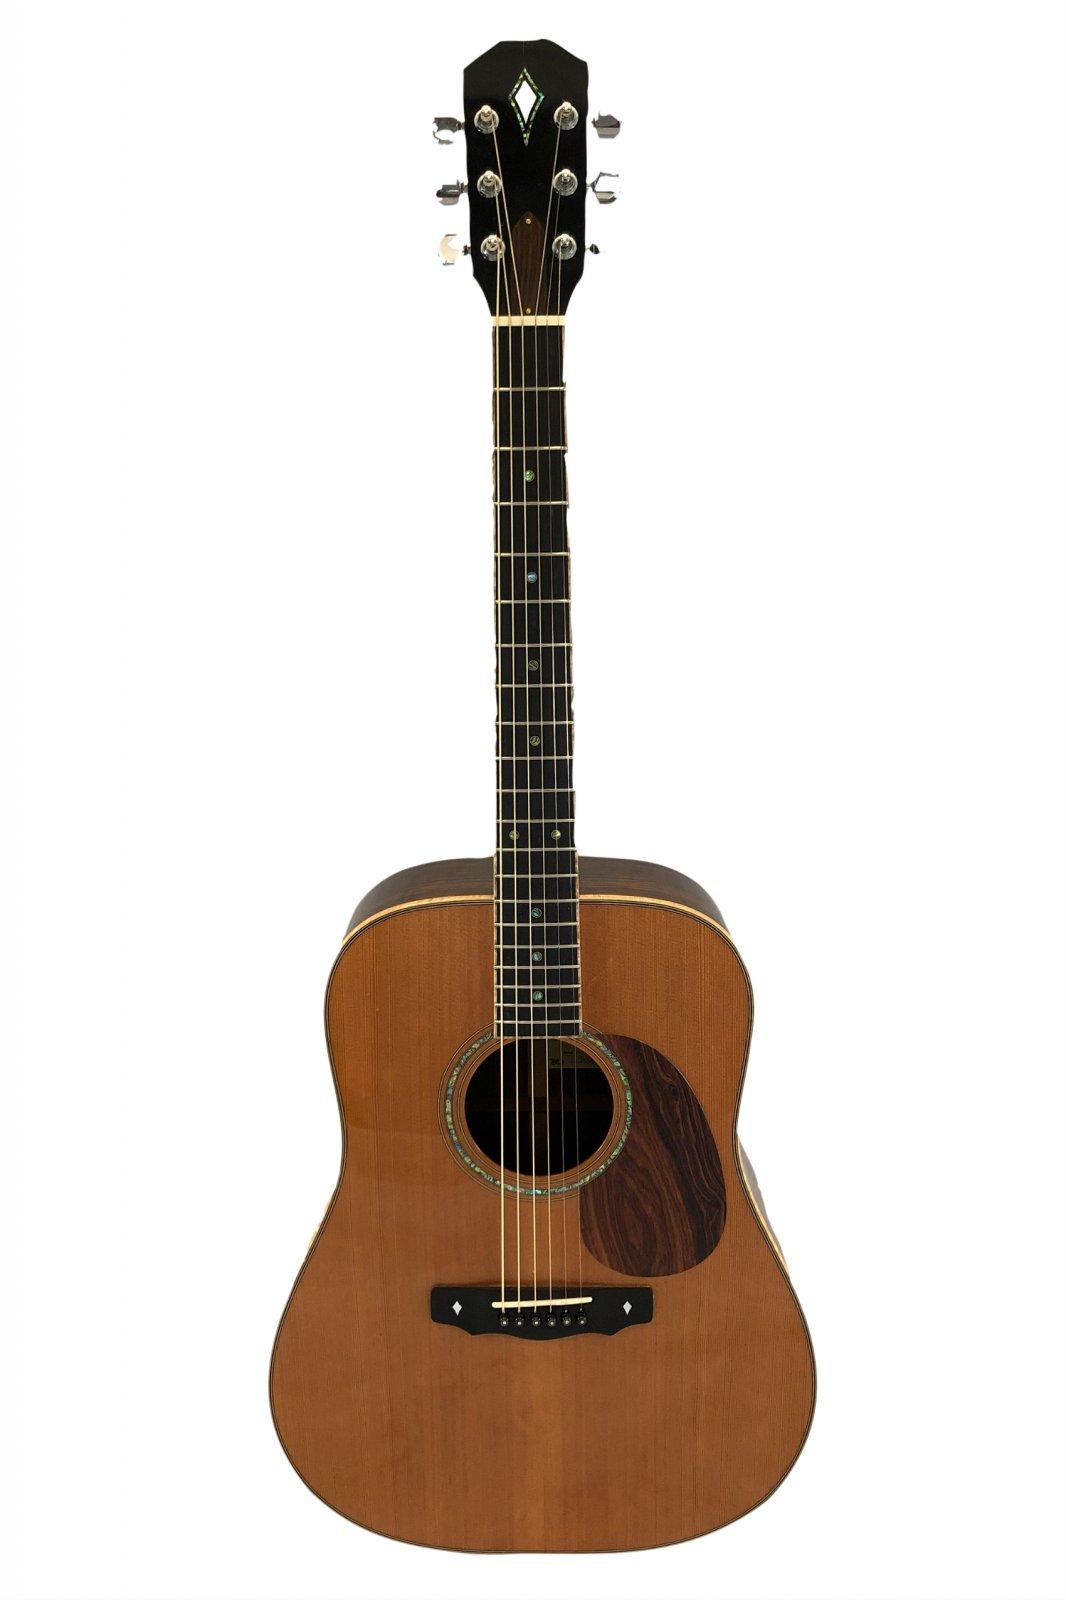 Preowned Custom Sierra Strings Acoustic-Electric Guitar w/Case